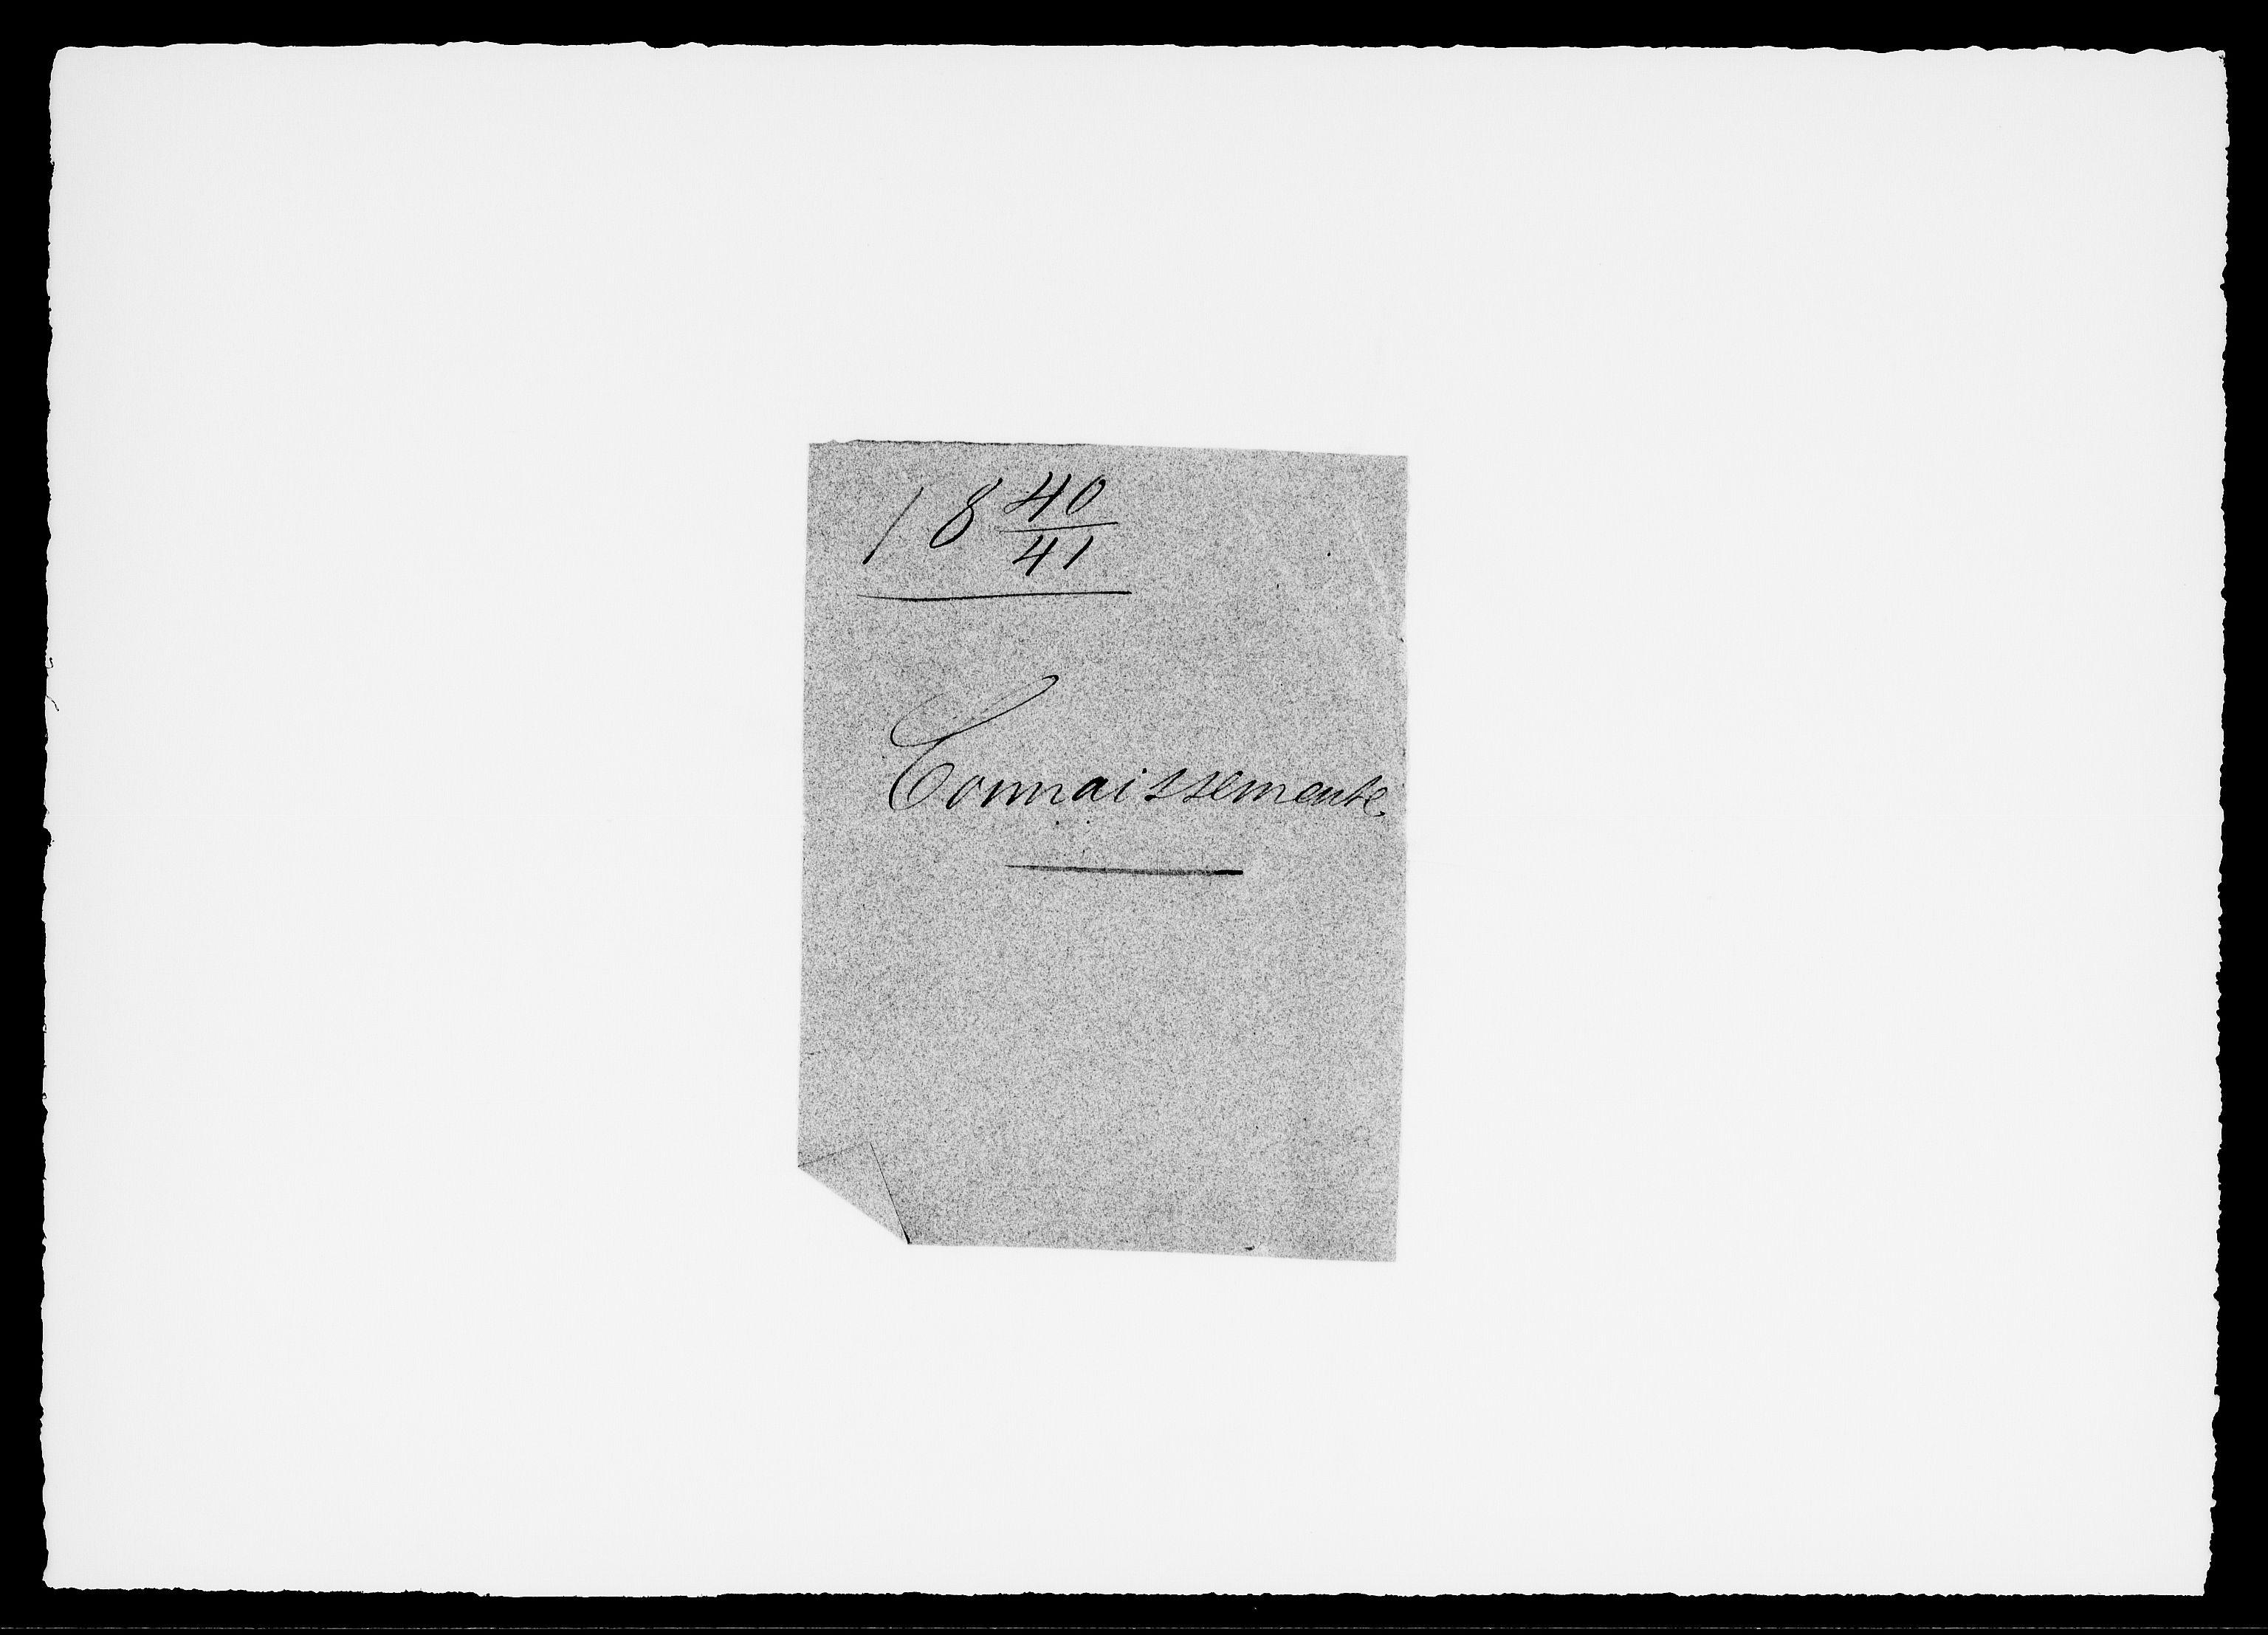 RA, Modums Blaafarveværk, G/Gd/Gdc/L0227, 1840-1849, s. 2